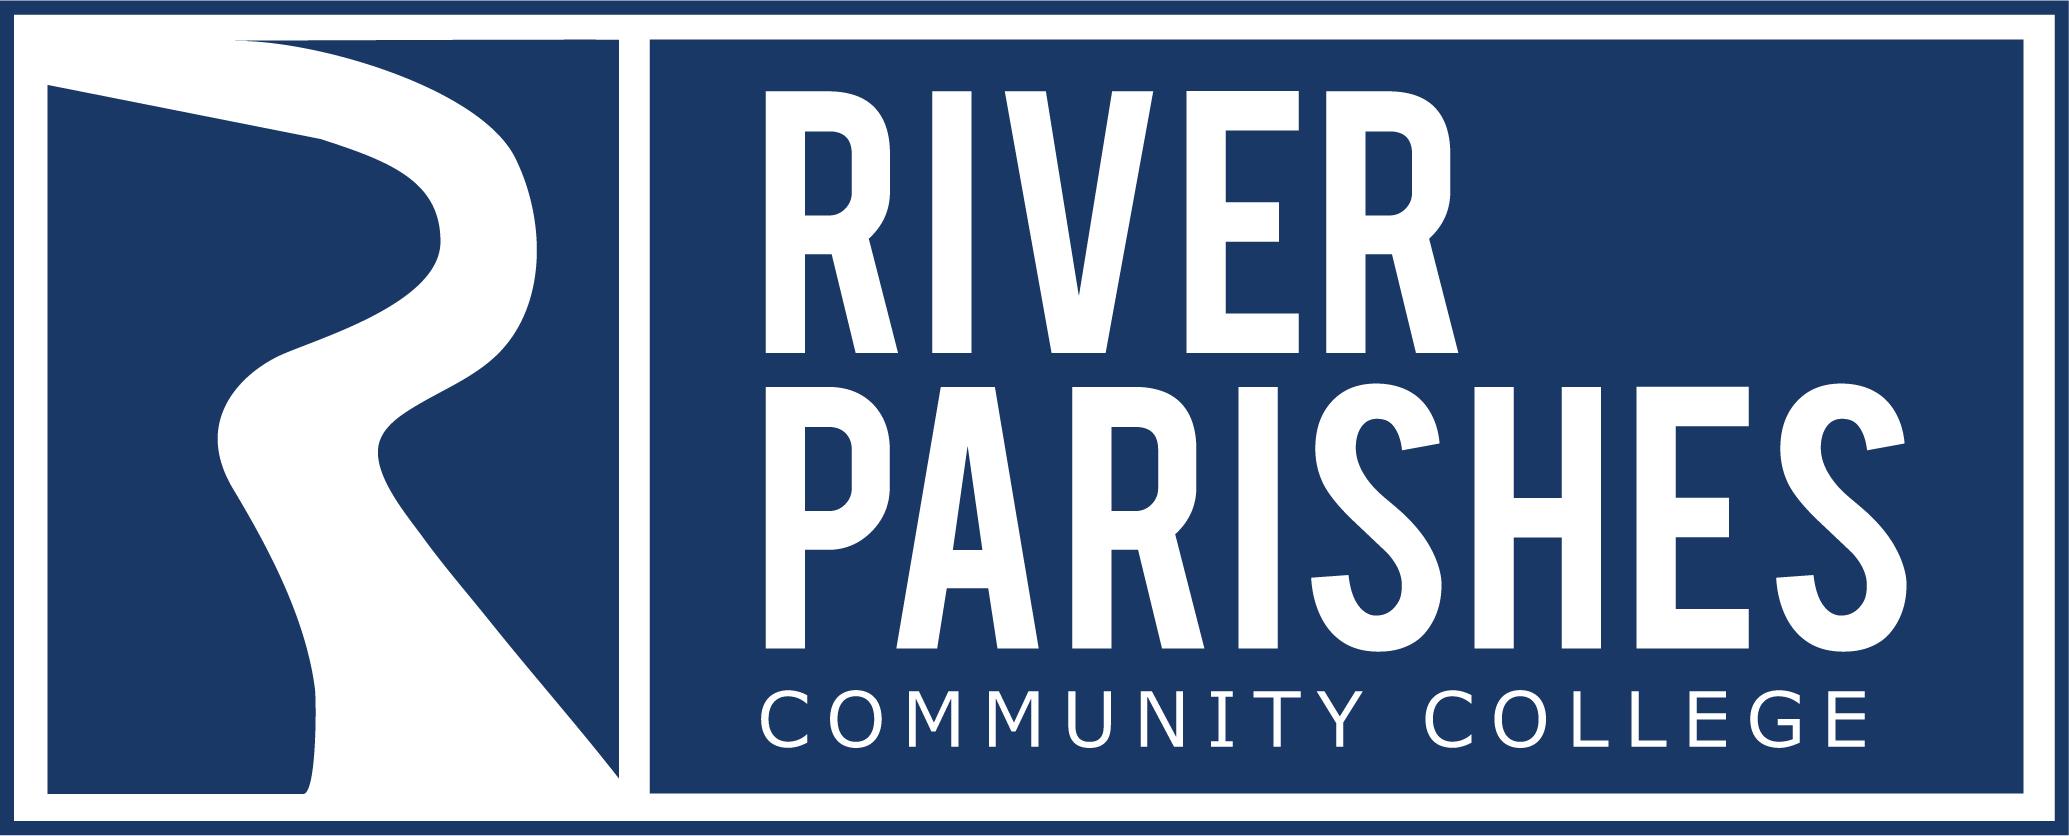 RPCC_official-logo-blue-2-01